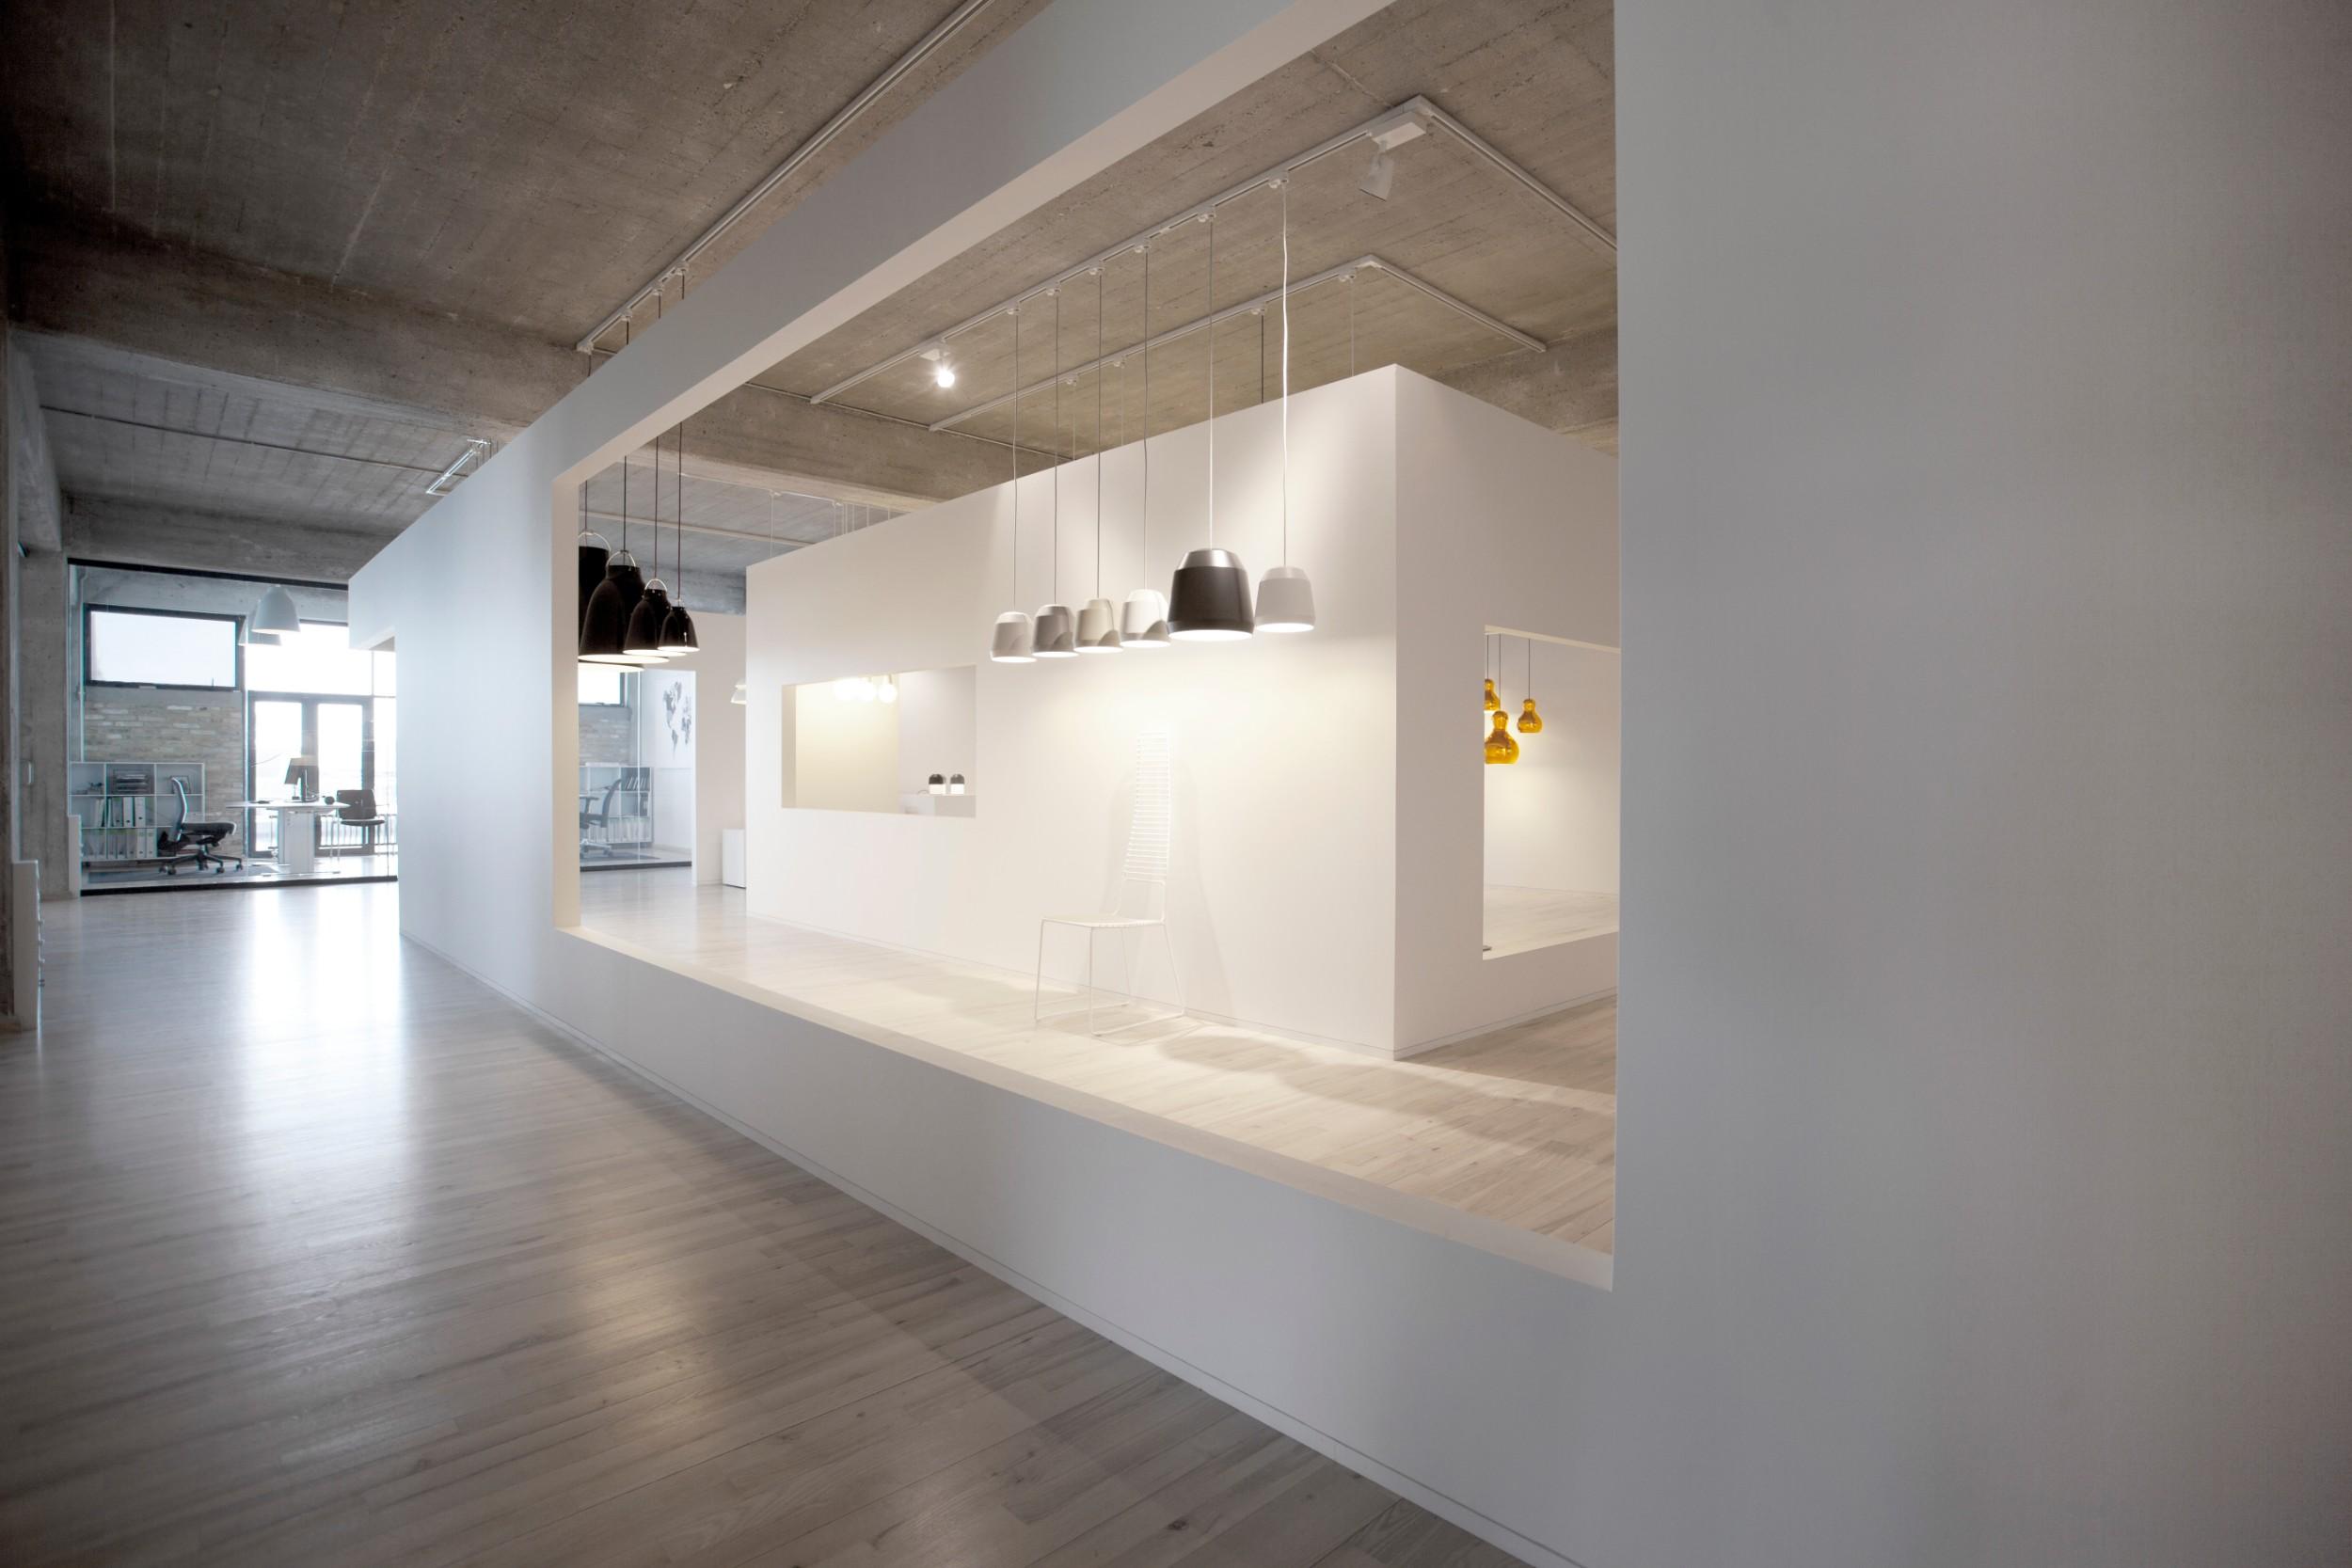 sofie-ladefoged-interior-lightyears-showroom-07.jpg